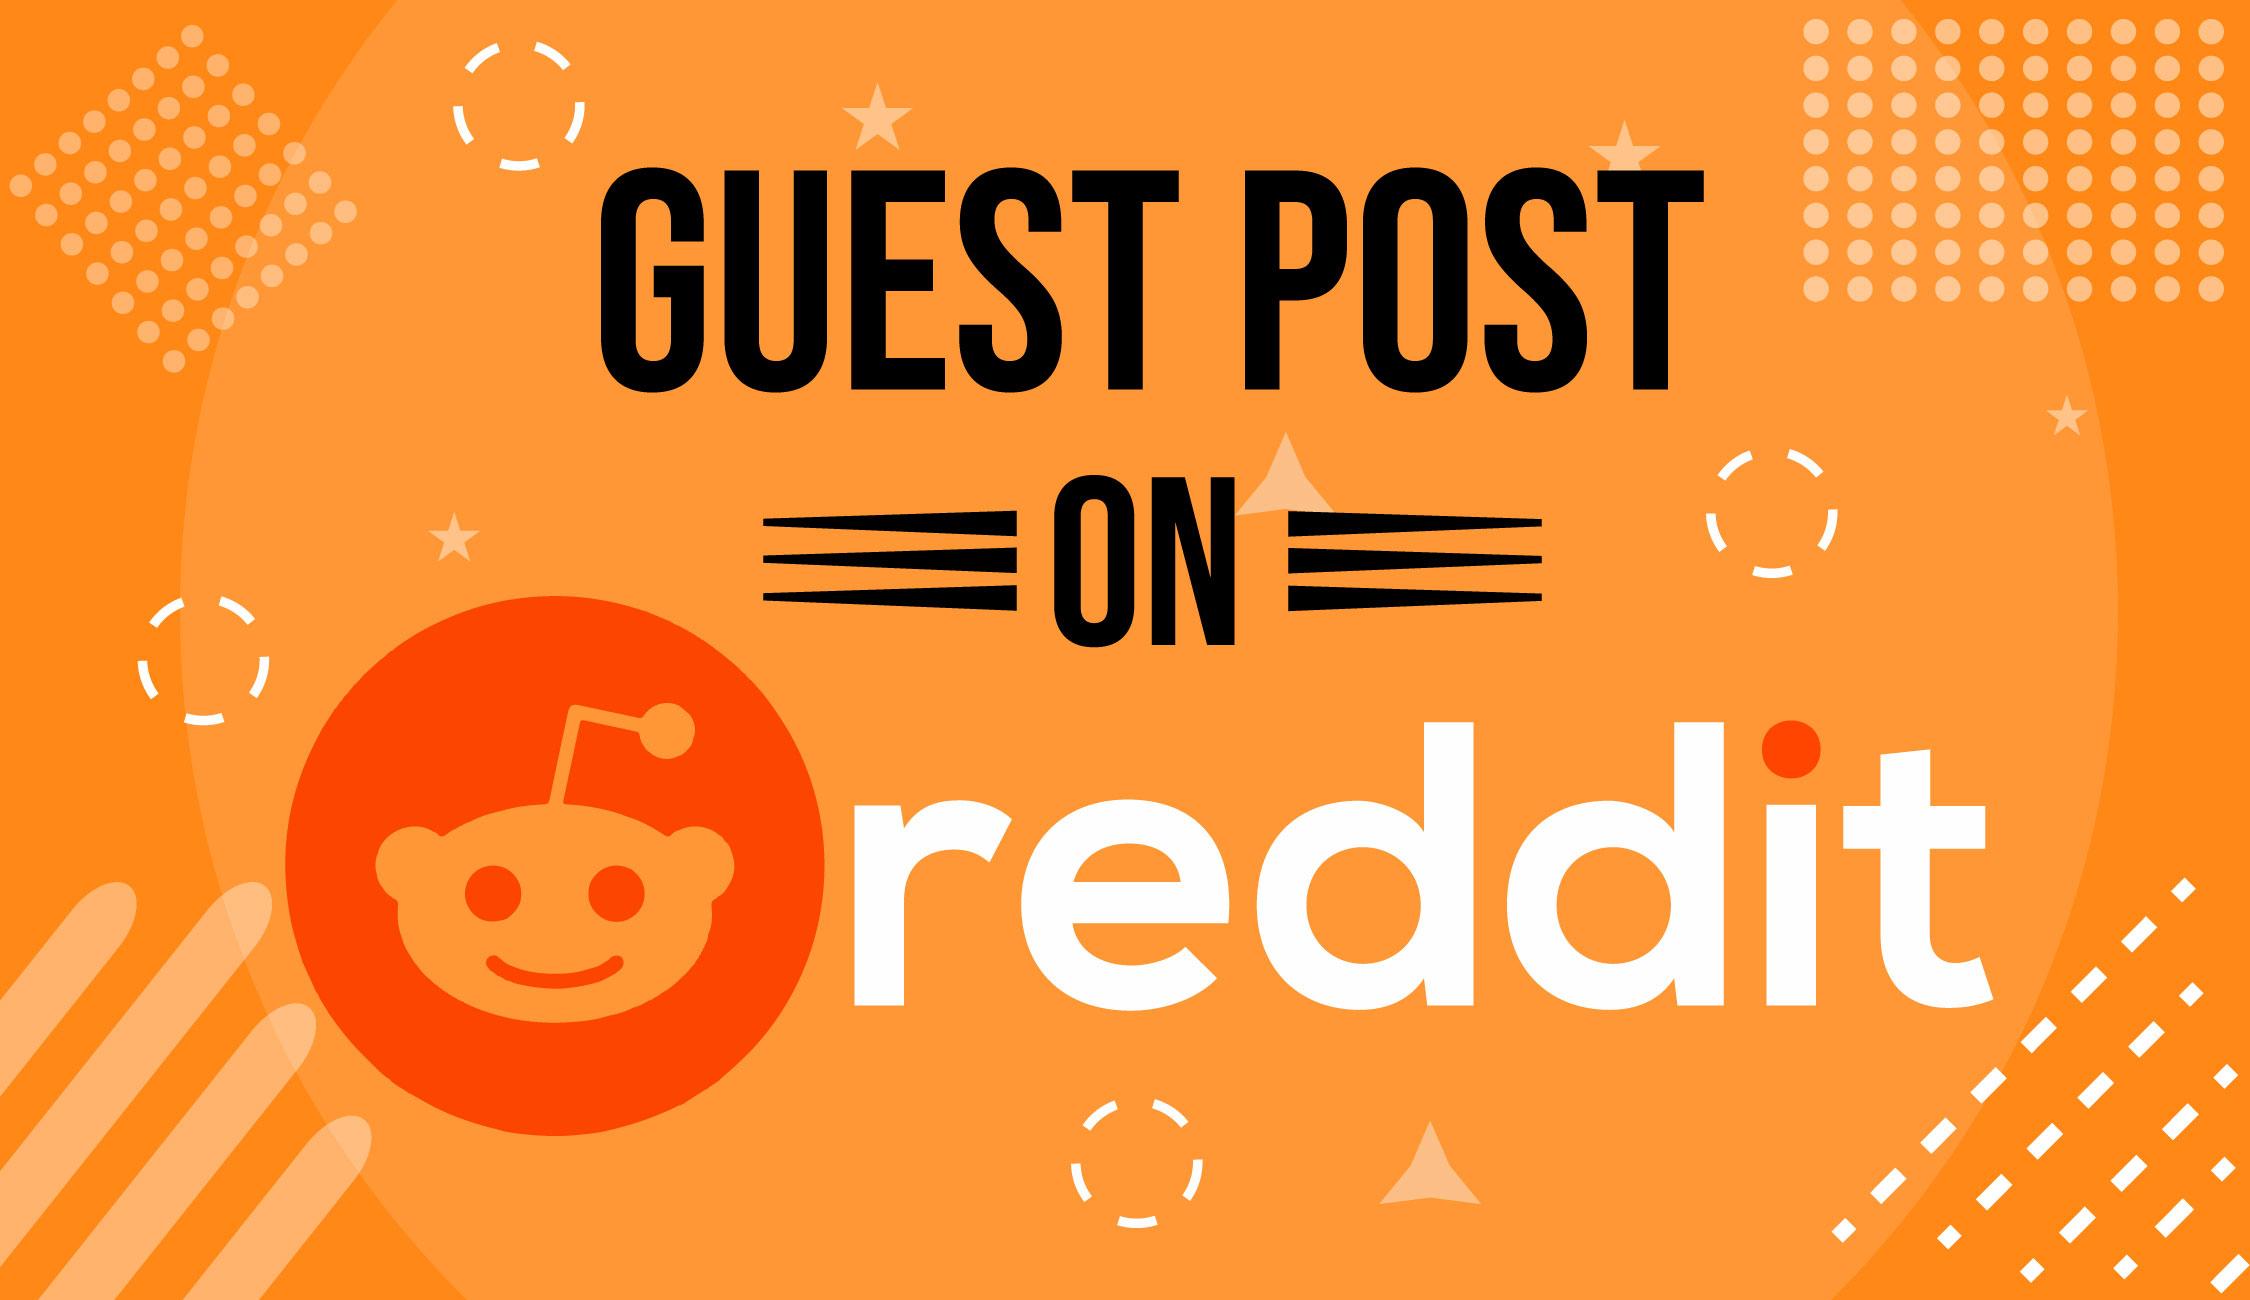 Promote your website by publishing 5HQ Guest Blog Post on reddit. com